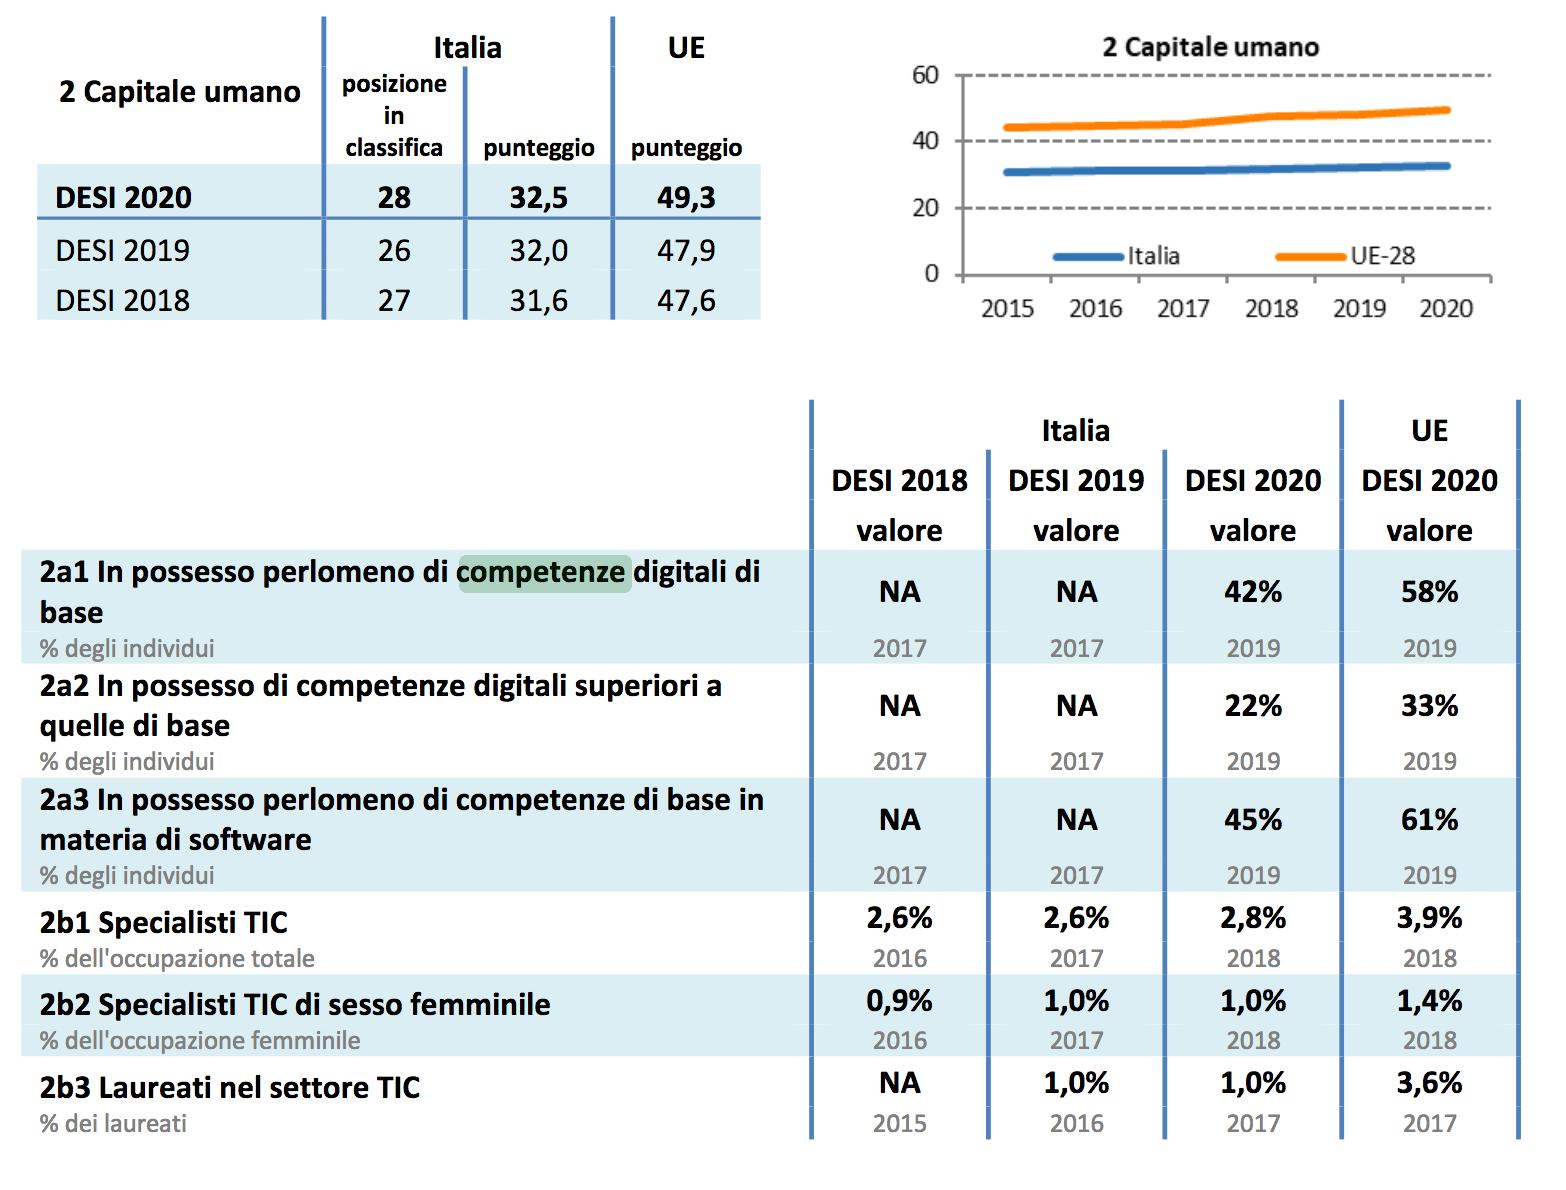 Competenze digitali DESI